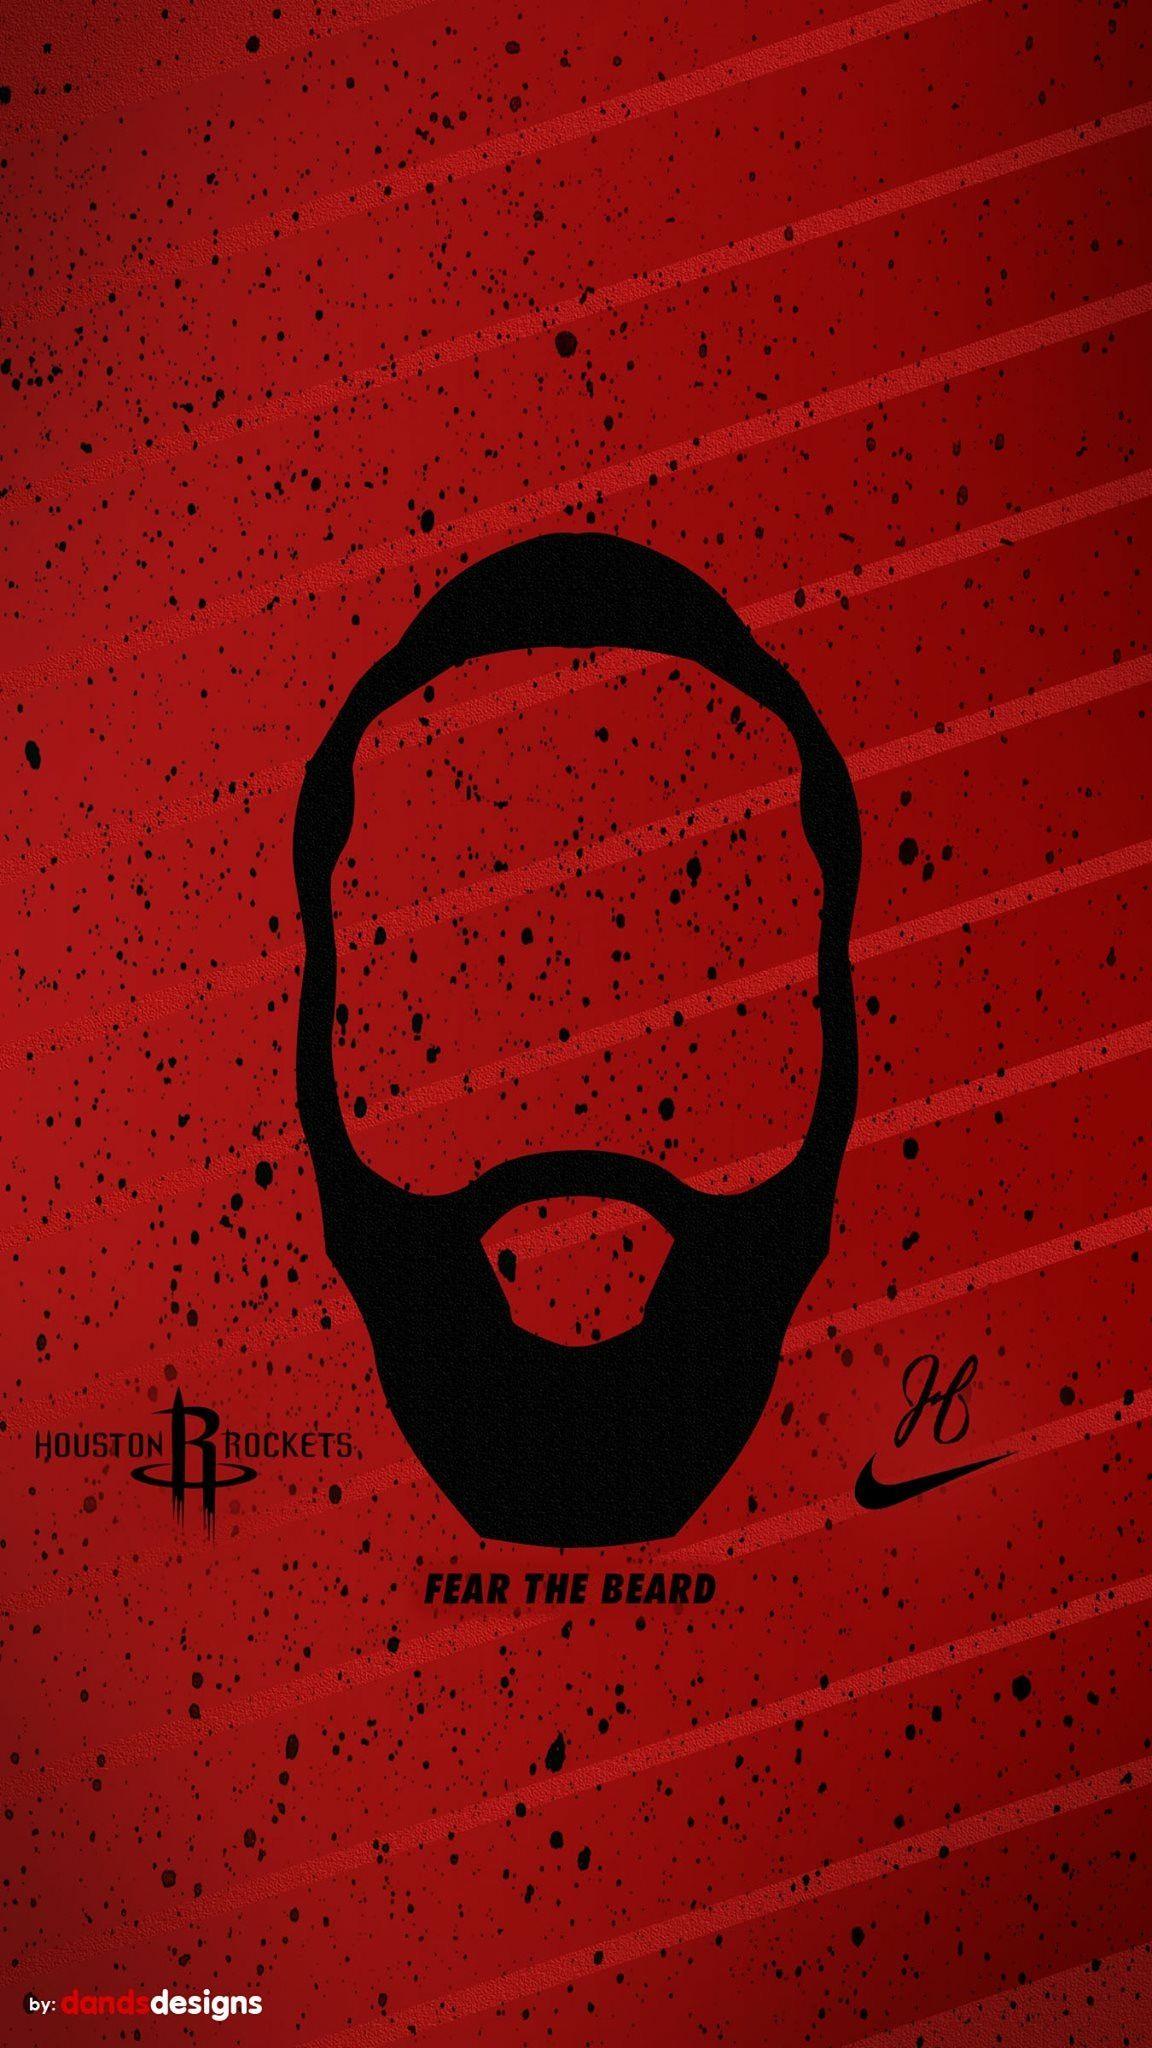 James harden clutch james harden harden basketball - James harden iphone wallpaper ...